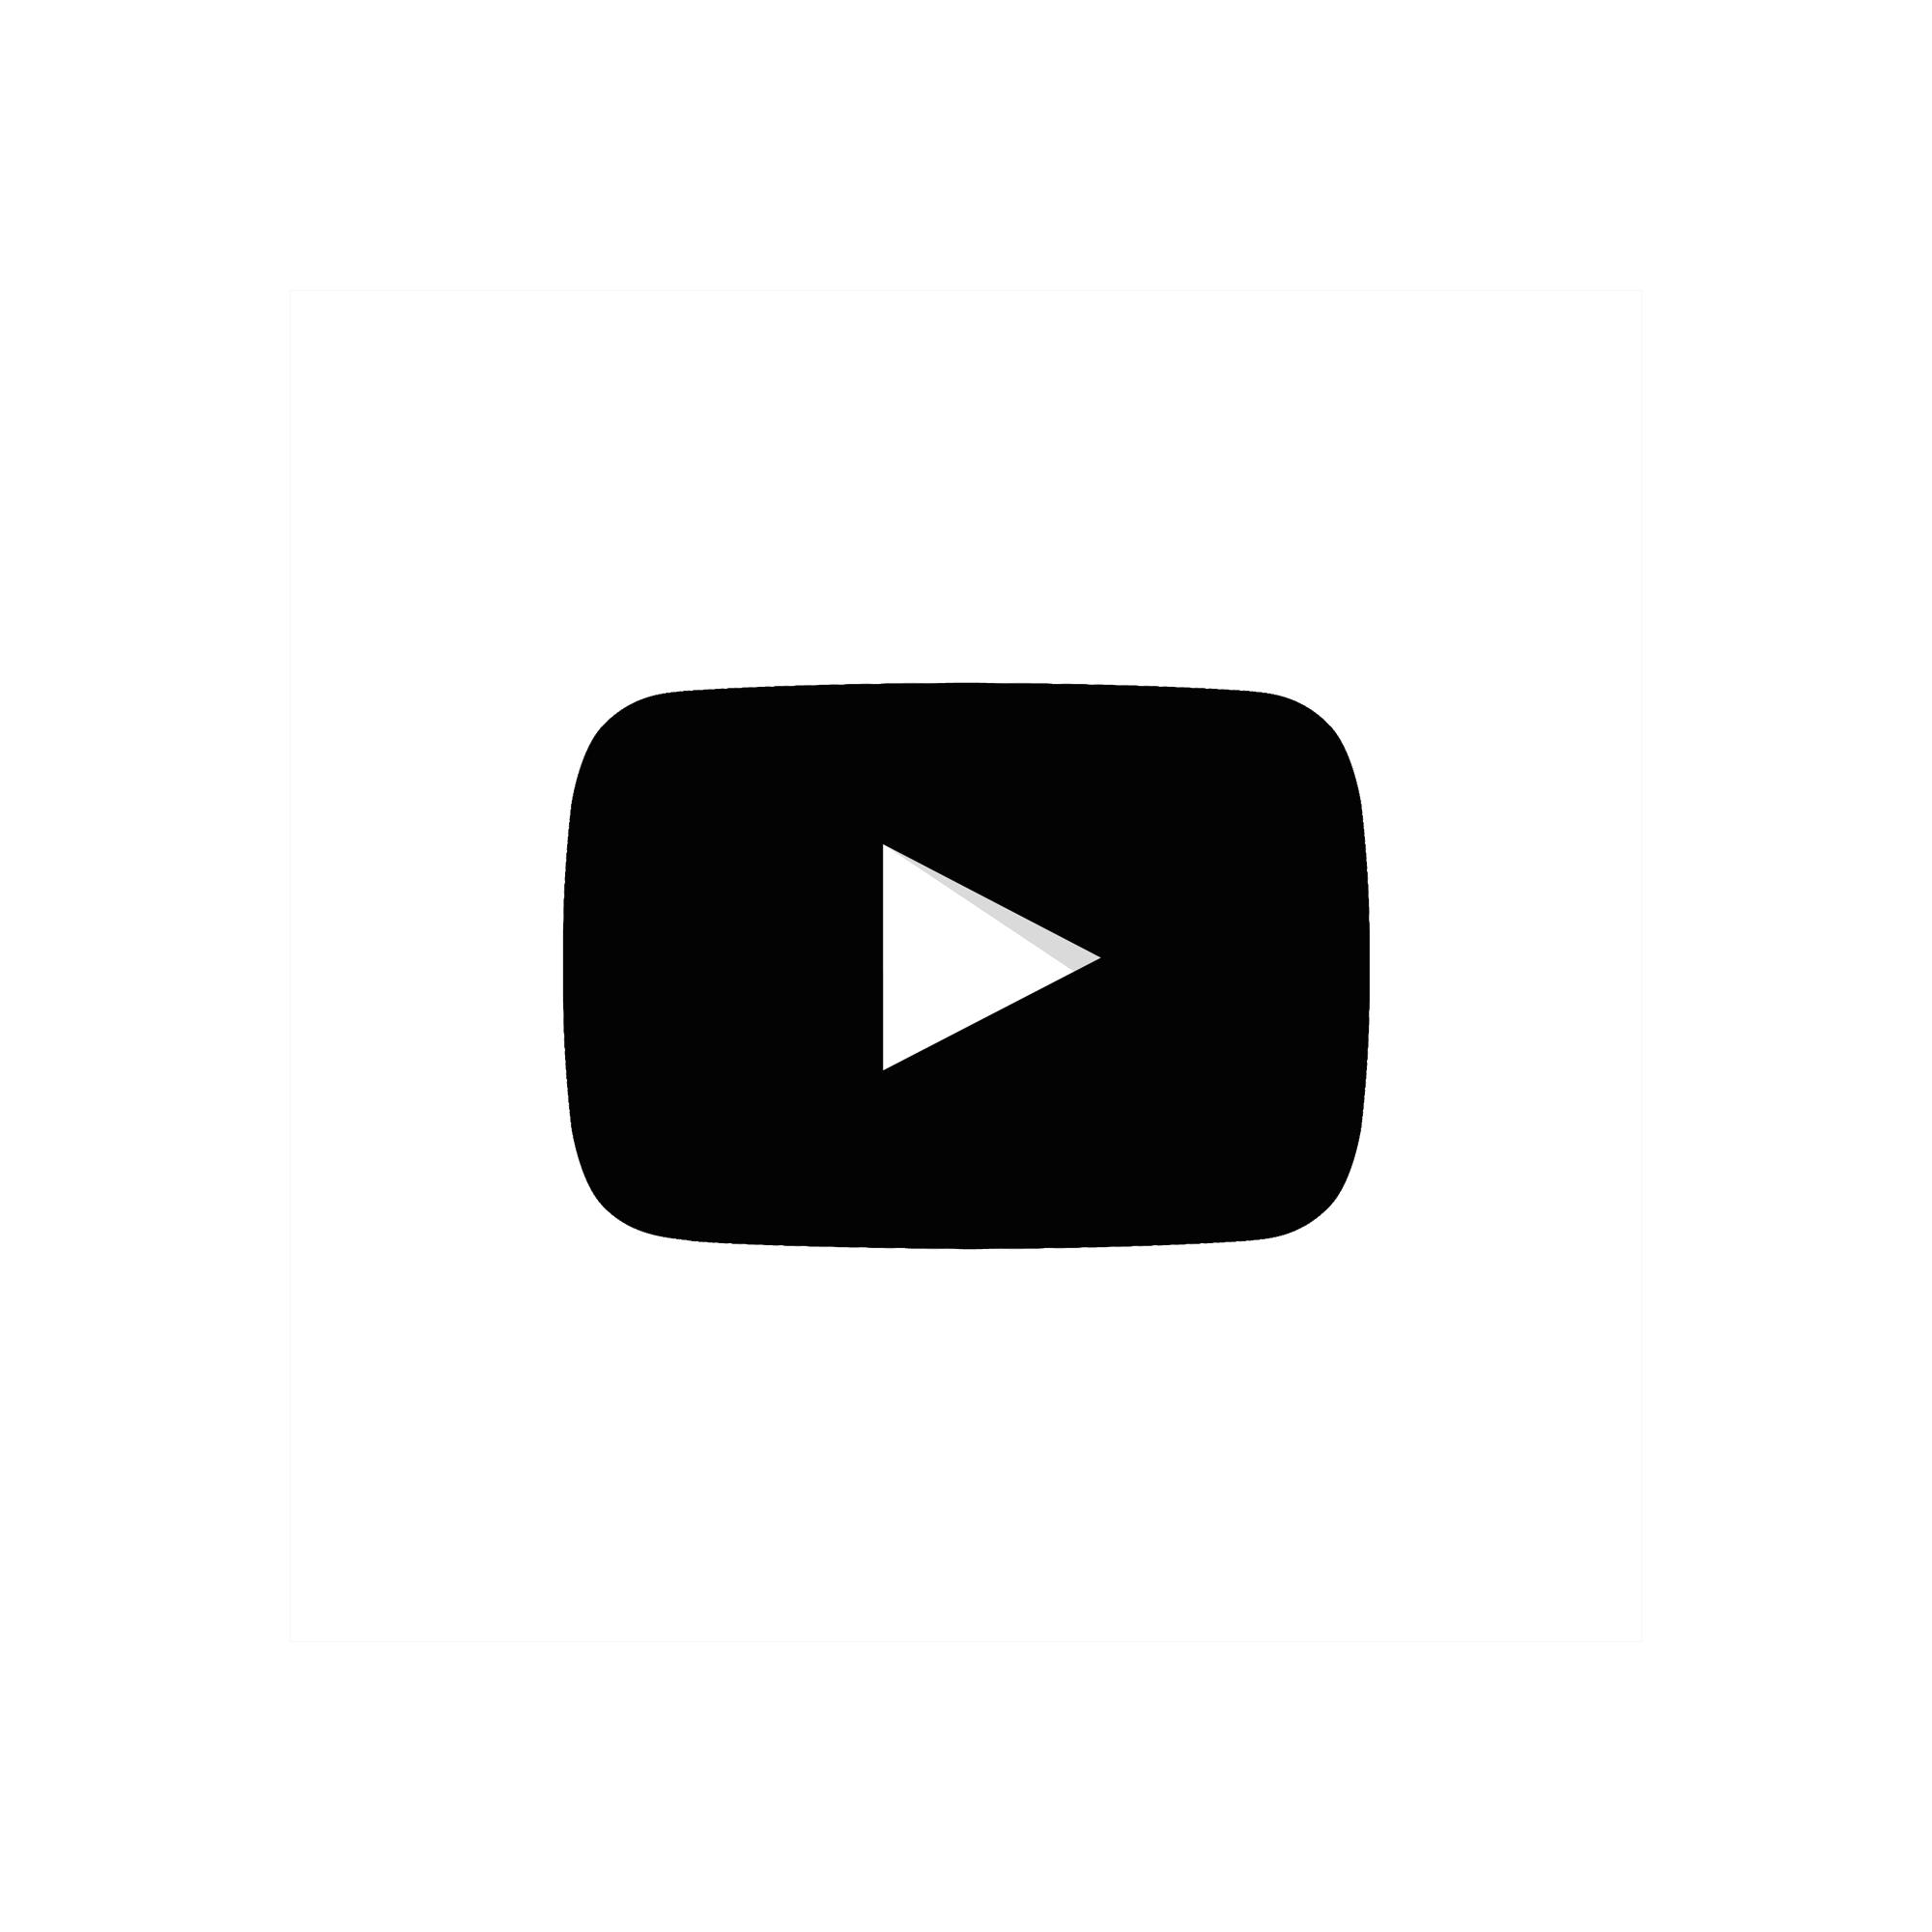 Youtube clipart dark. P pedal power meter